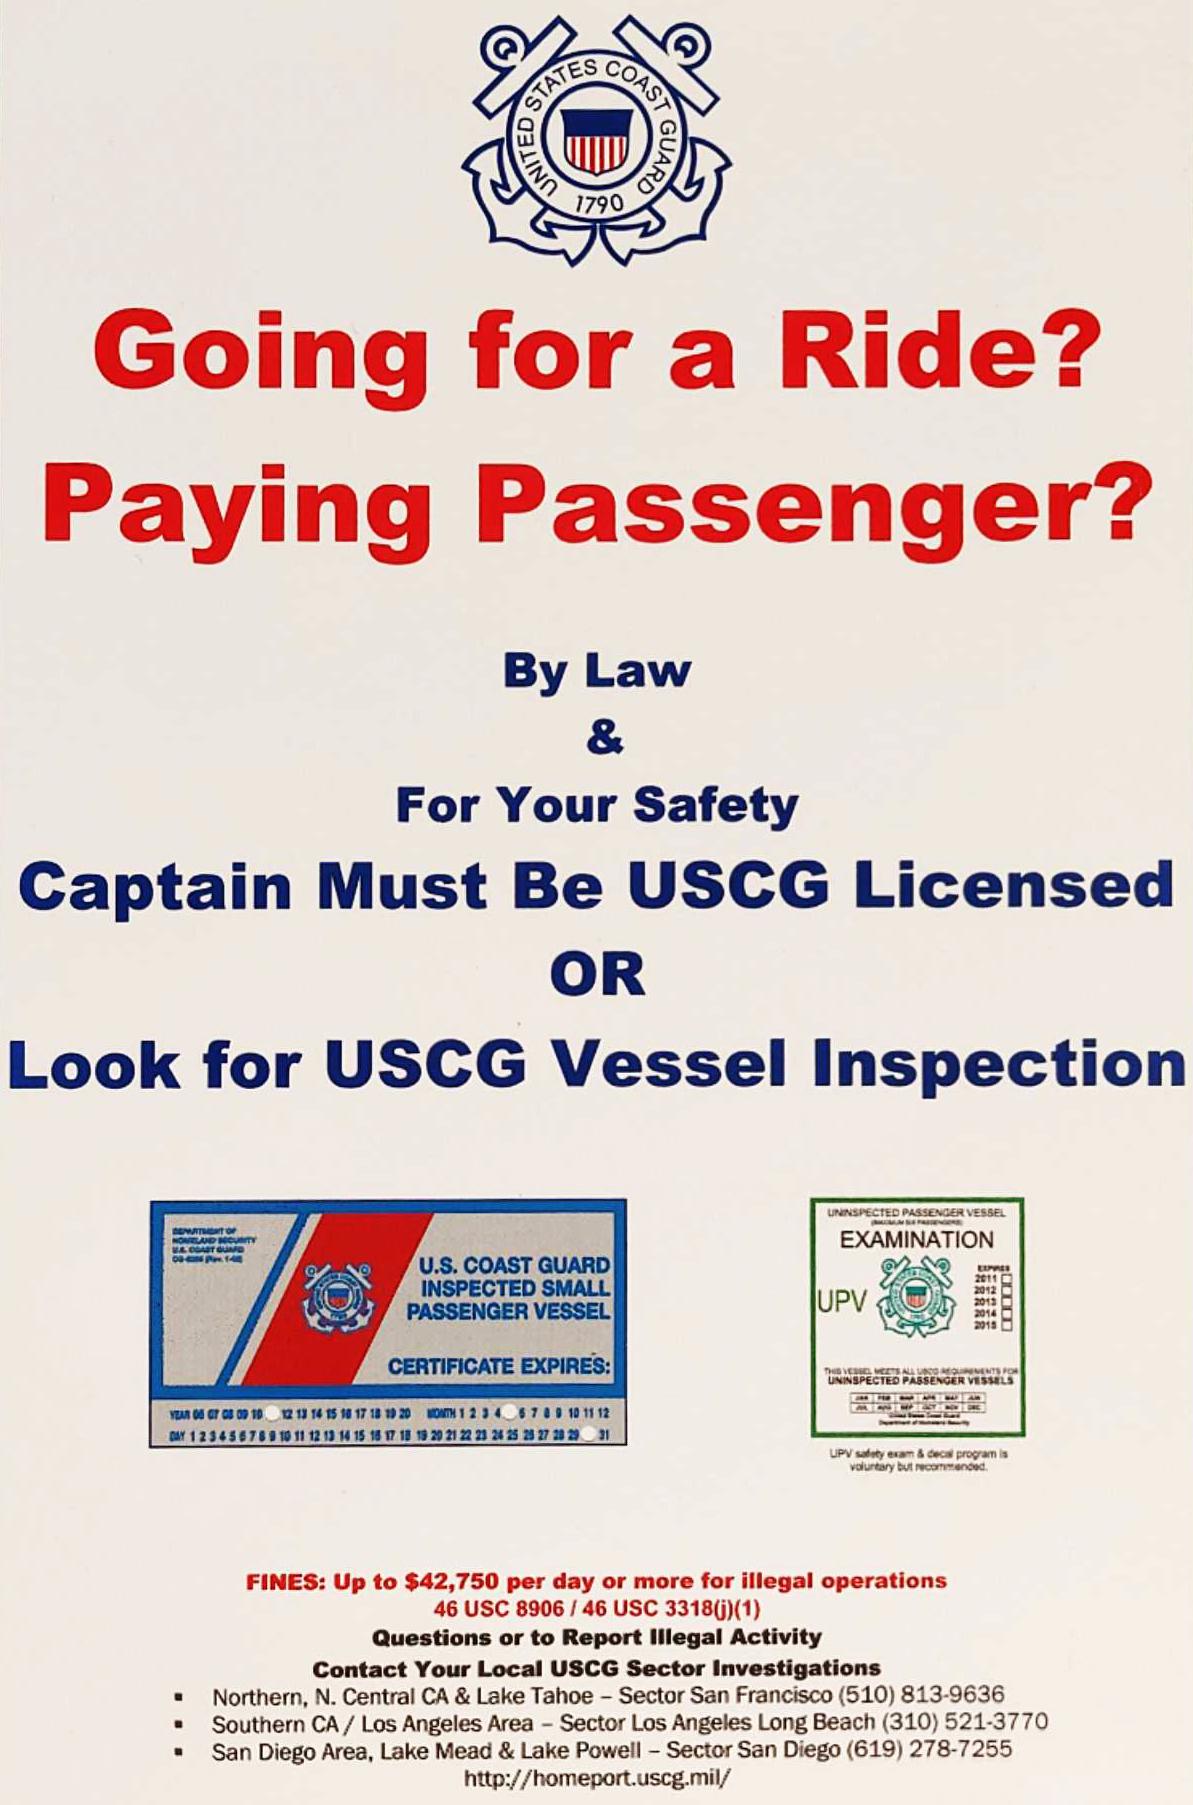 Coast Guard cautions public against illegal charters